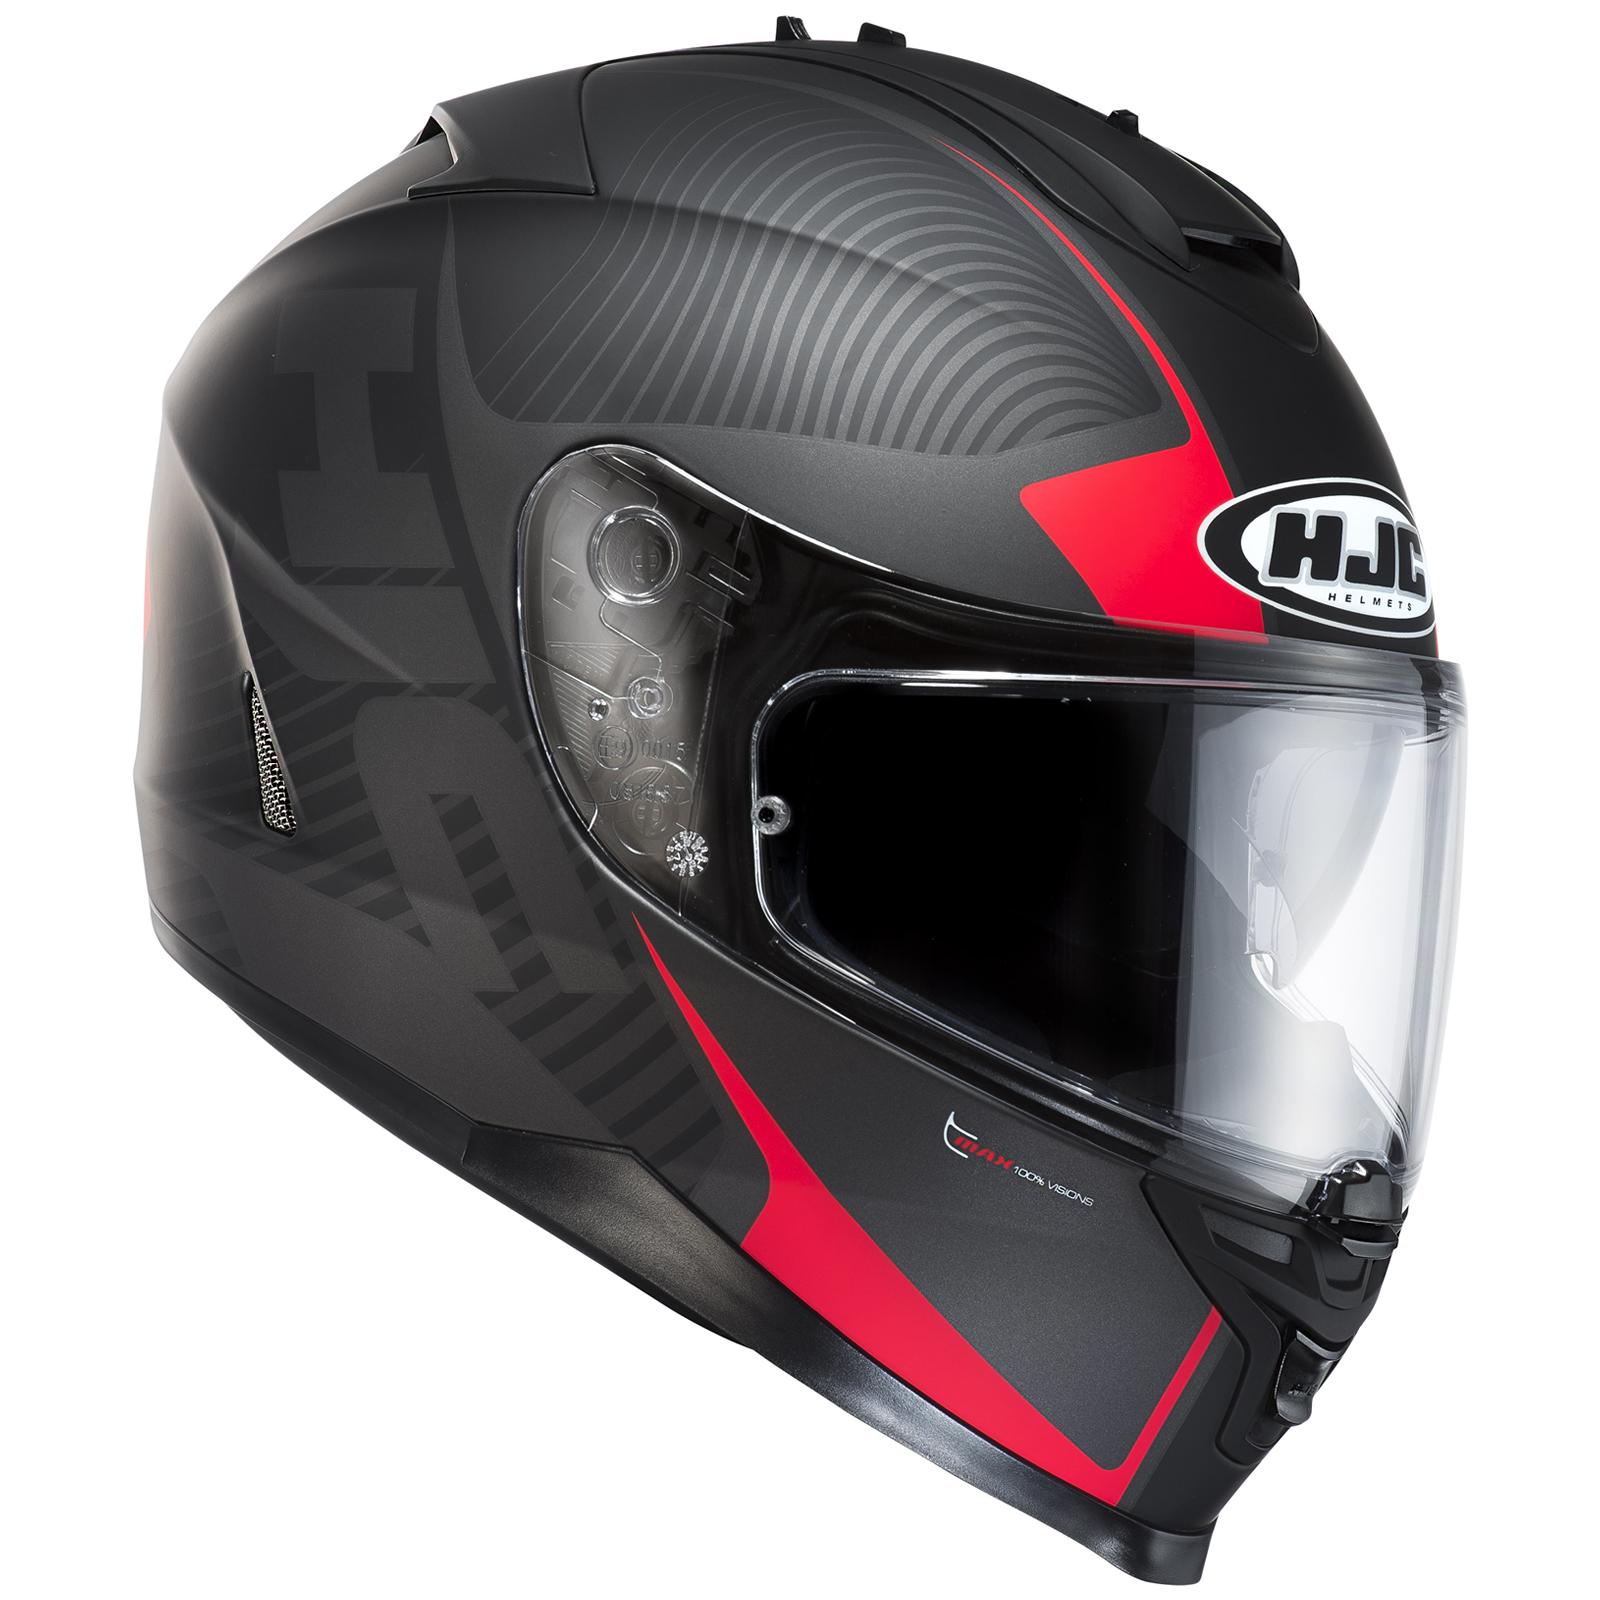 hjc is 17 mission matt black grey red motorcycle helmet. Black Bedroom Furniture Sets. Home Design Ideas